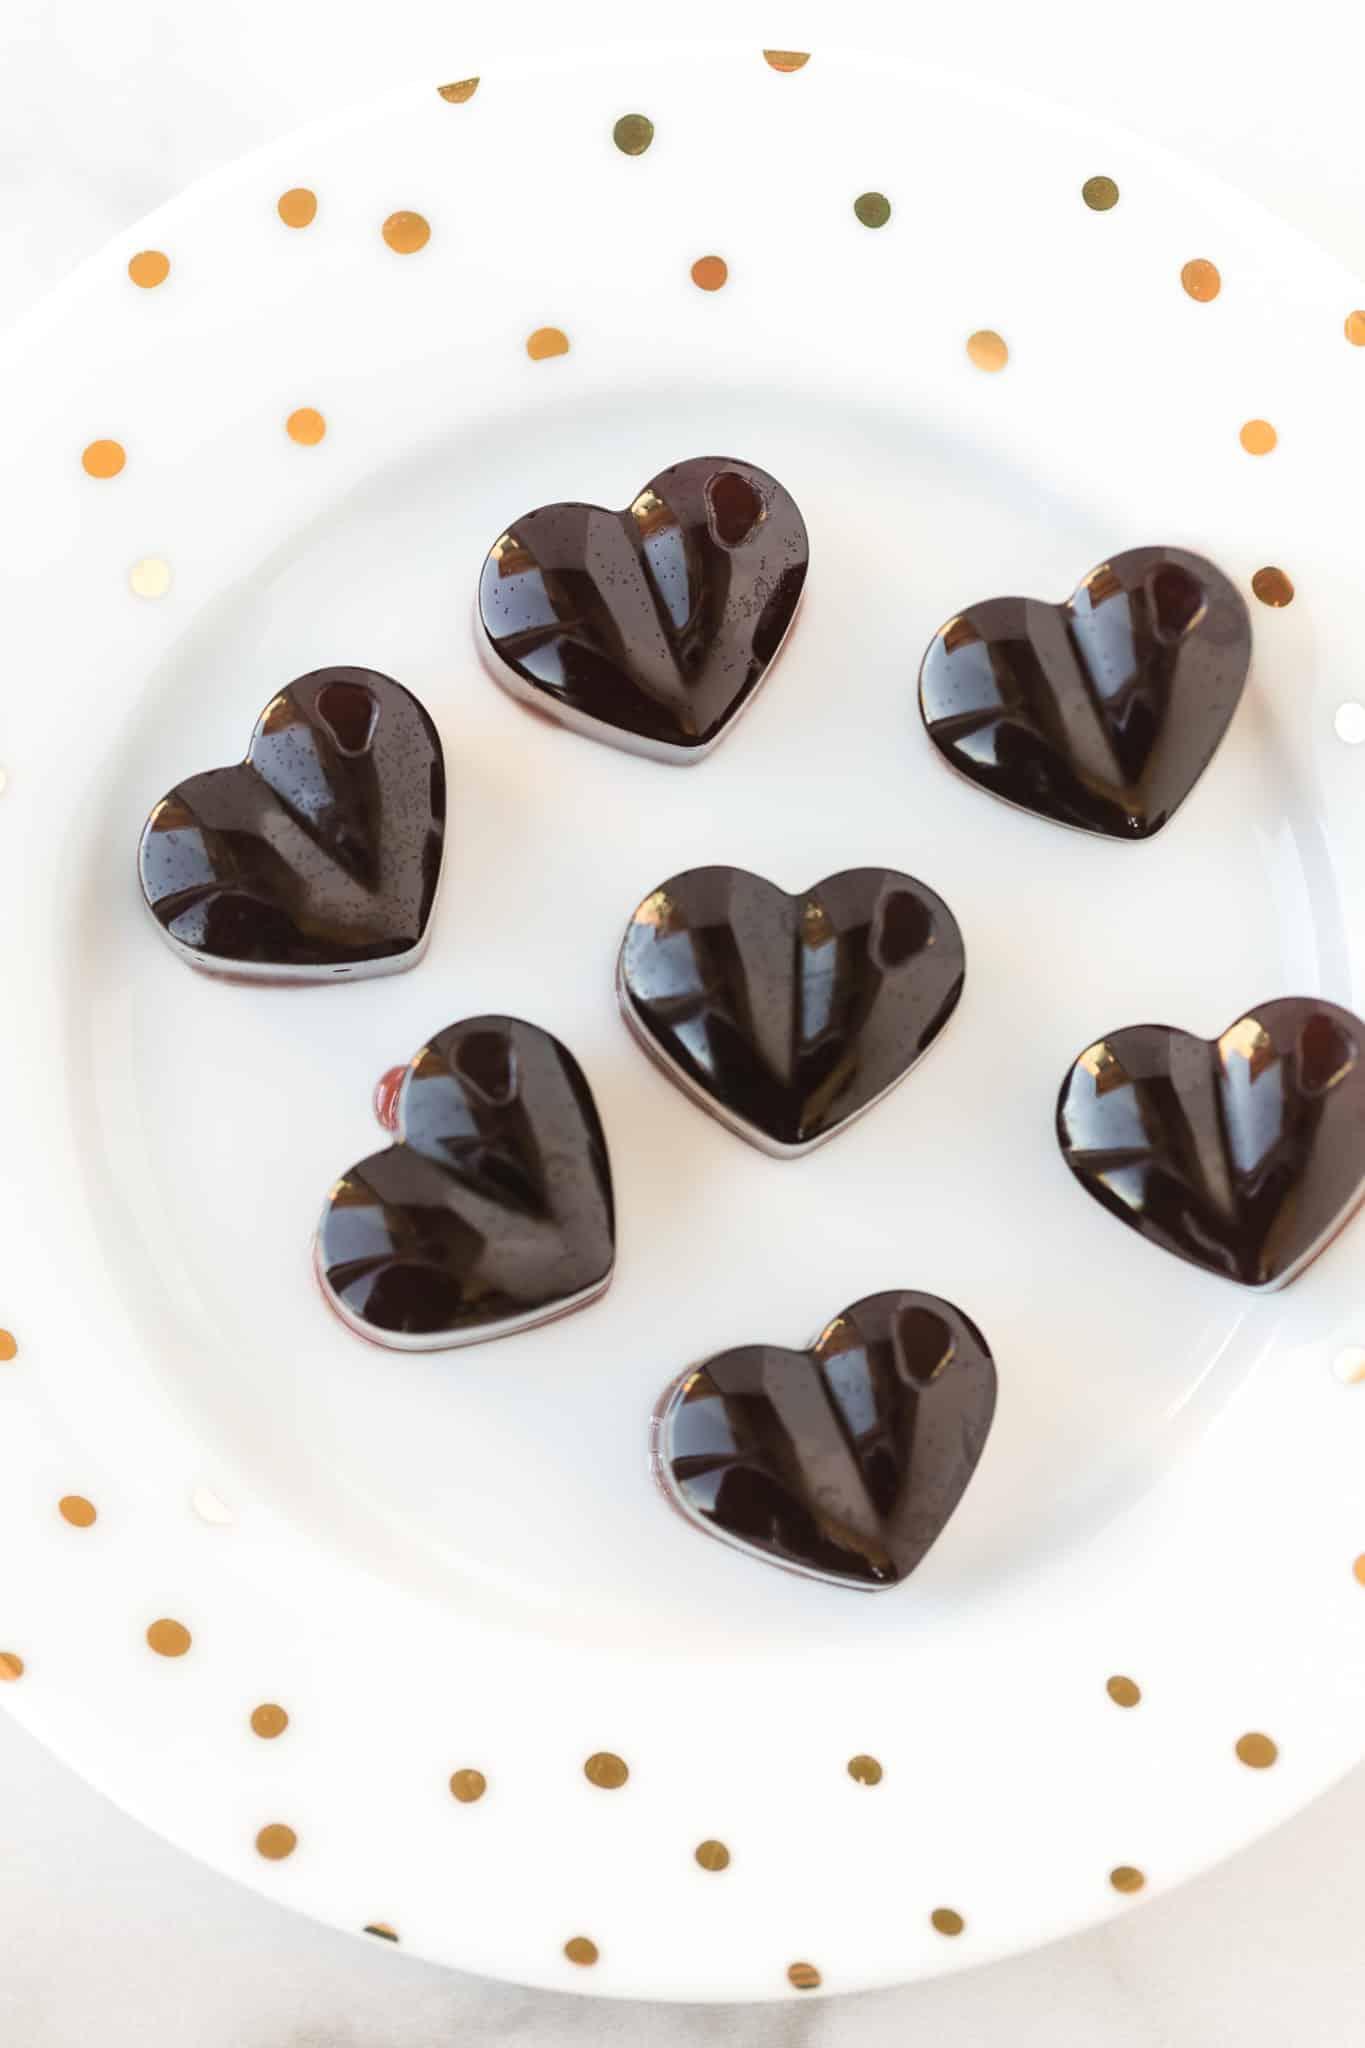 heart shaped homemade cbd gummies on a white plate